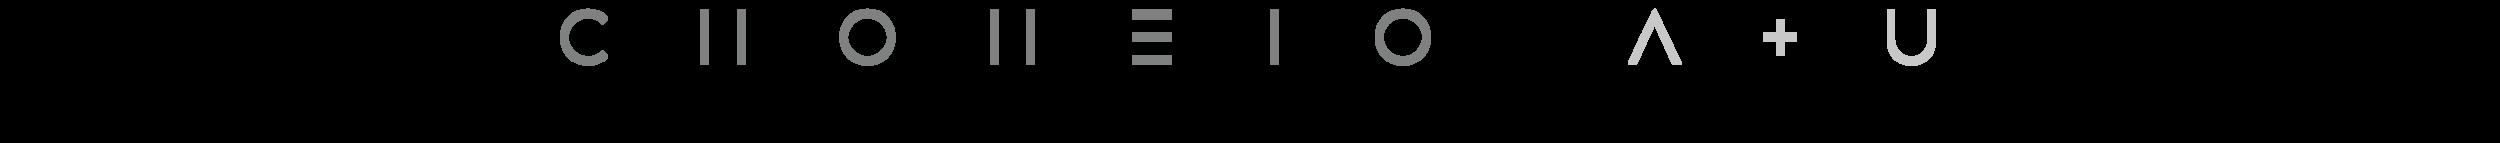 CHOHELO logo.png